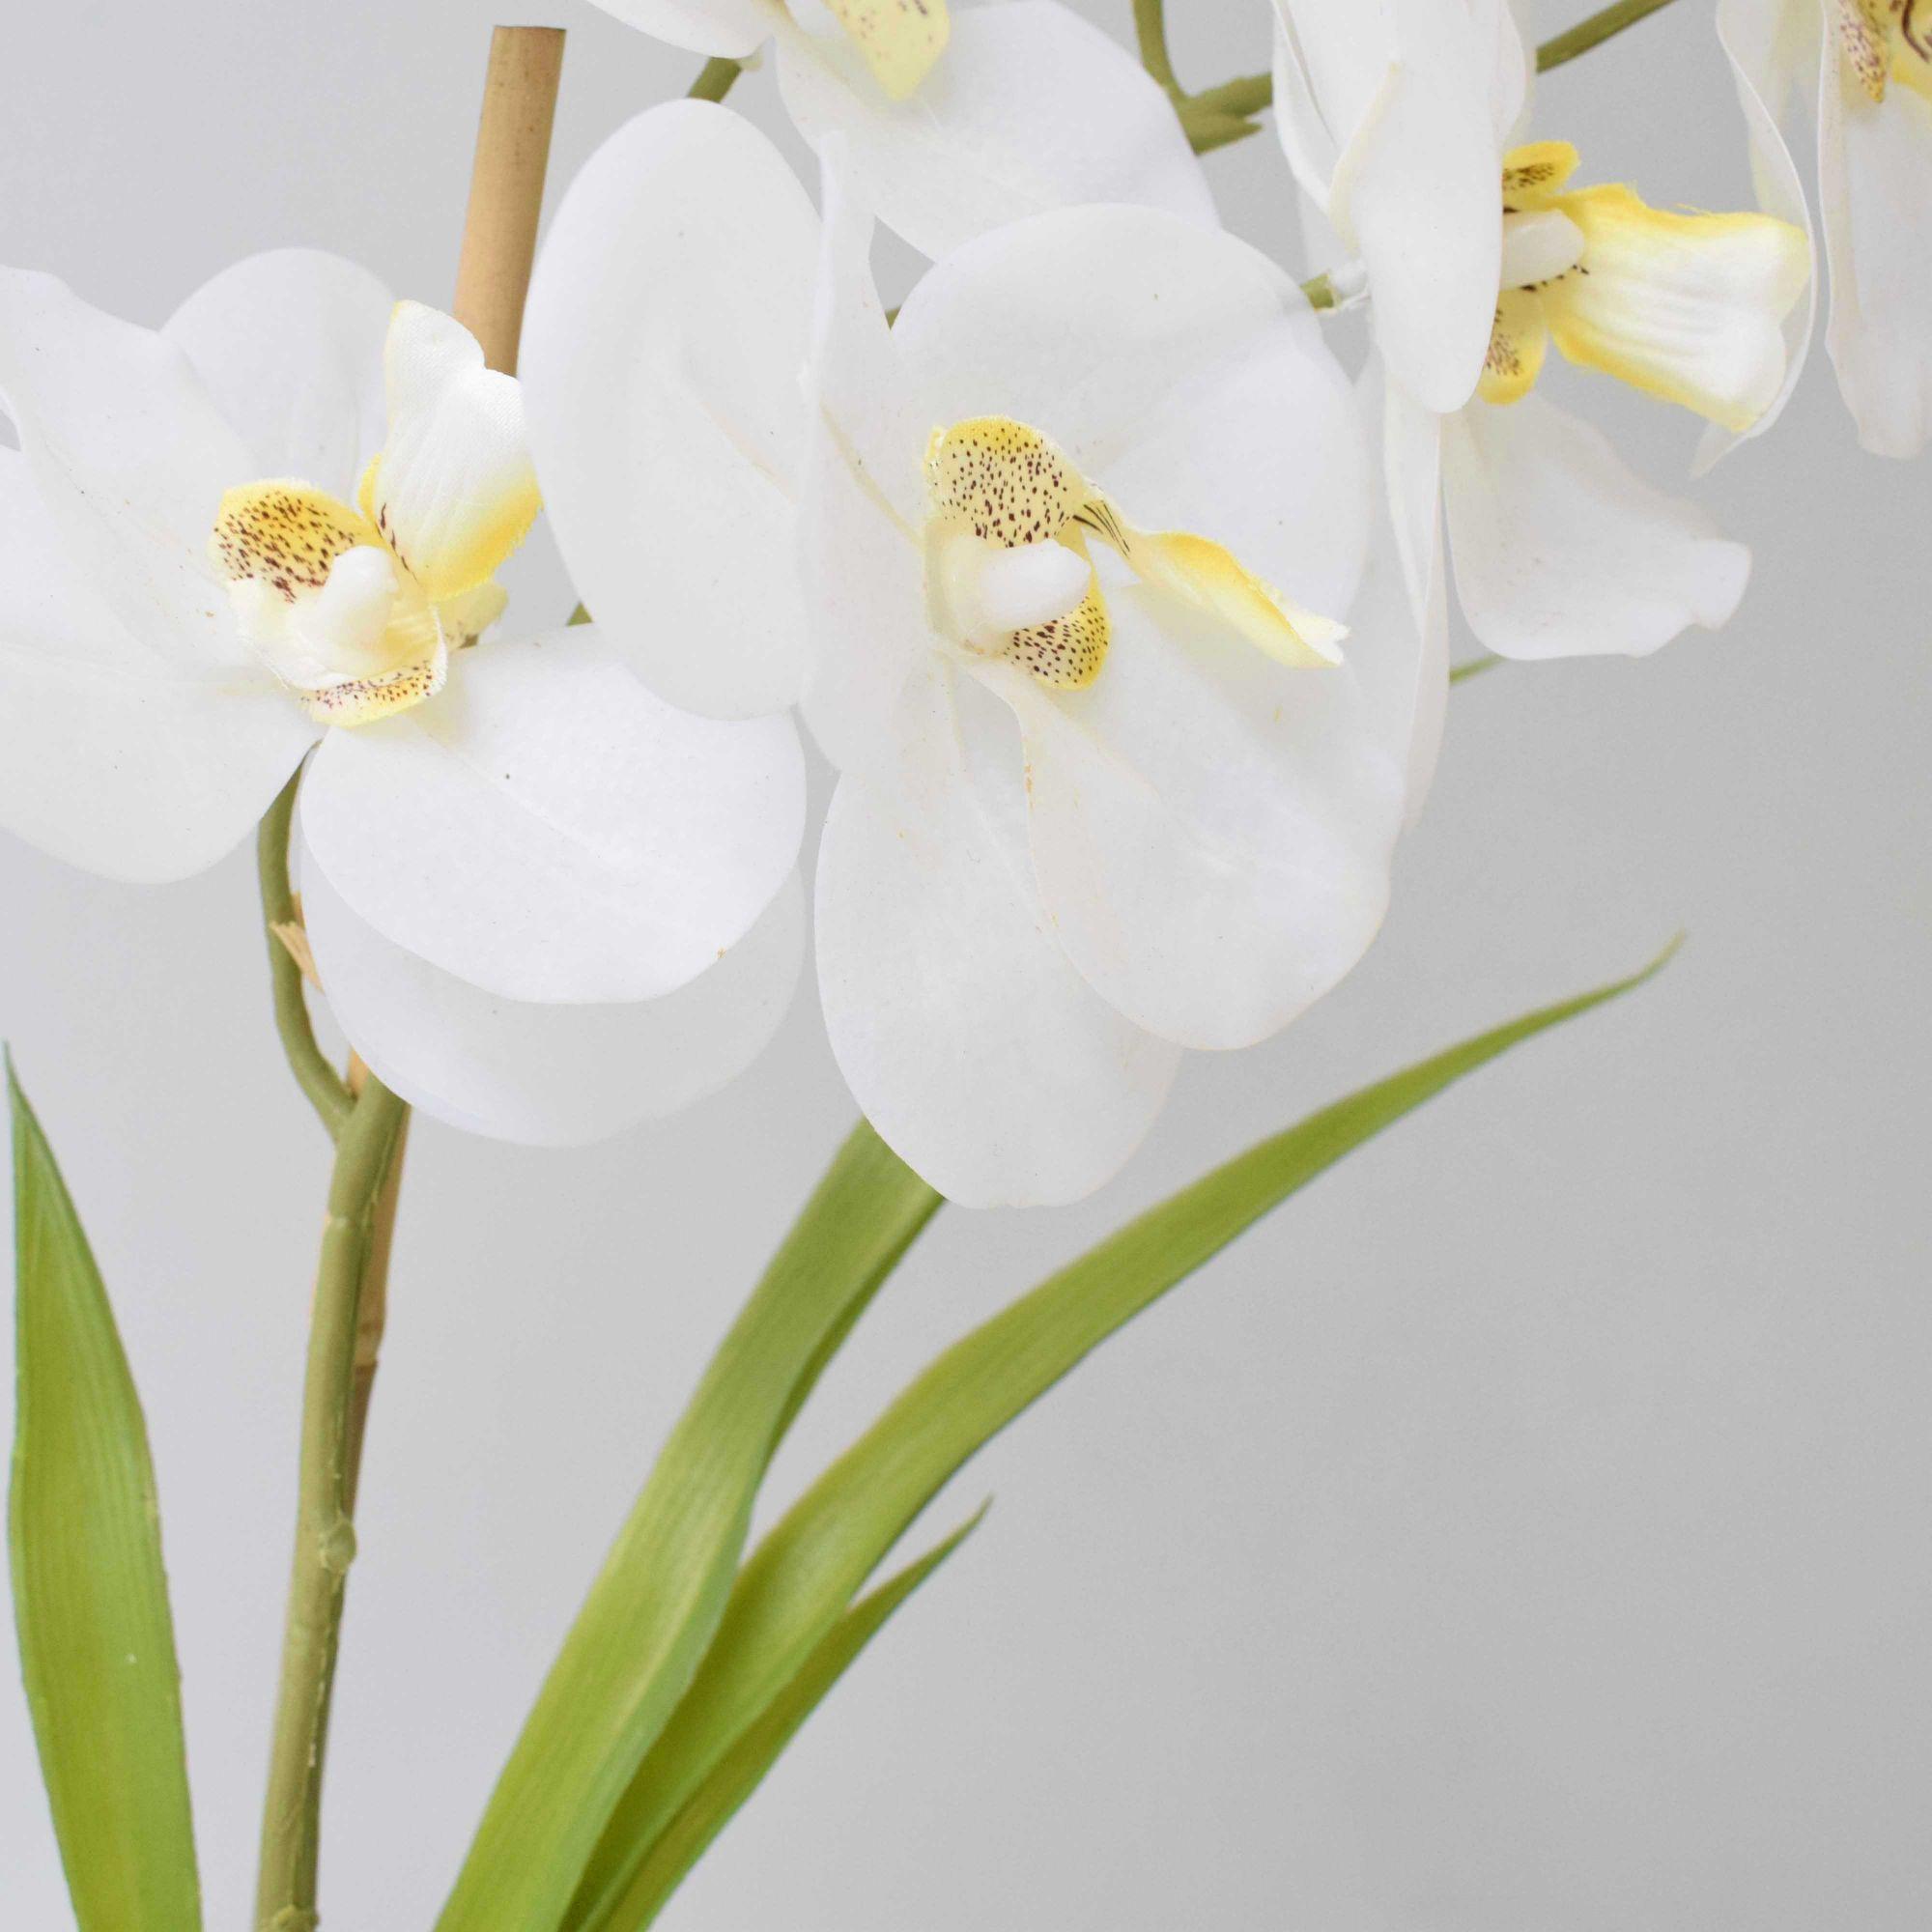 Flores artificiais Arranjo de Flores Orquídea de Silicone no Vaso de Sisal|Linha permanente Formosinha